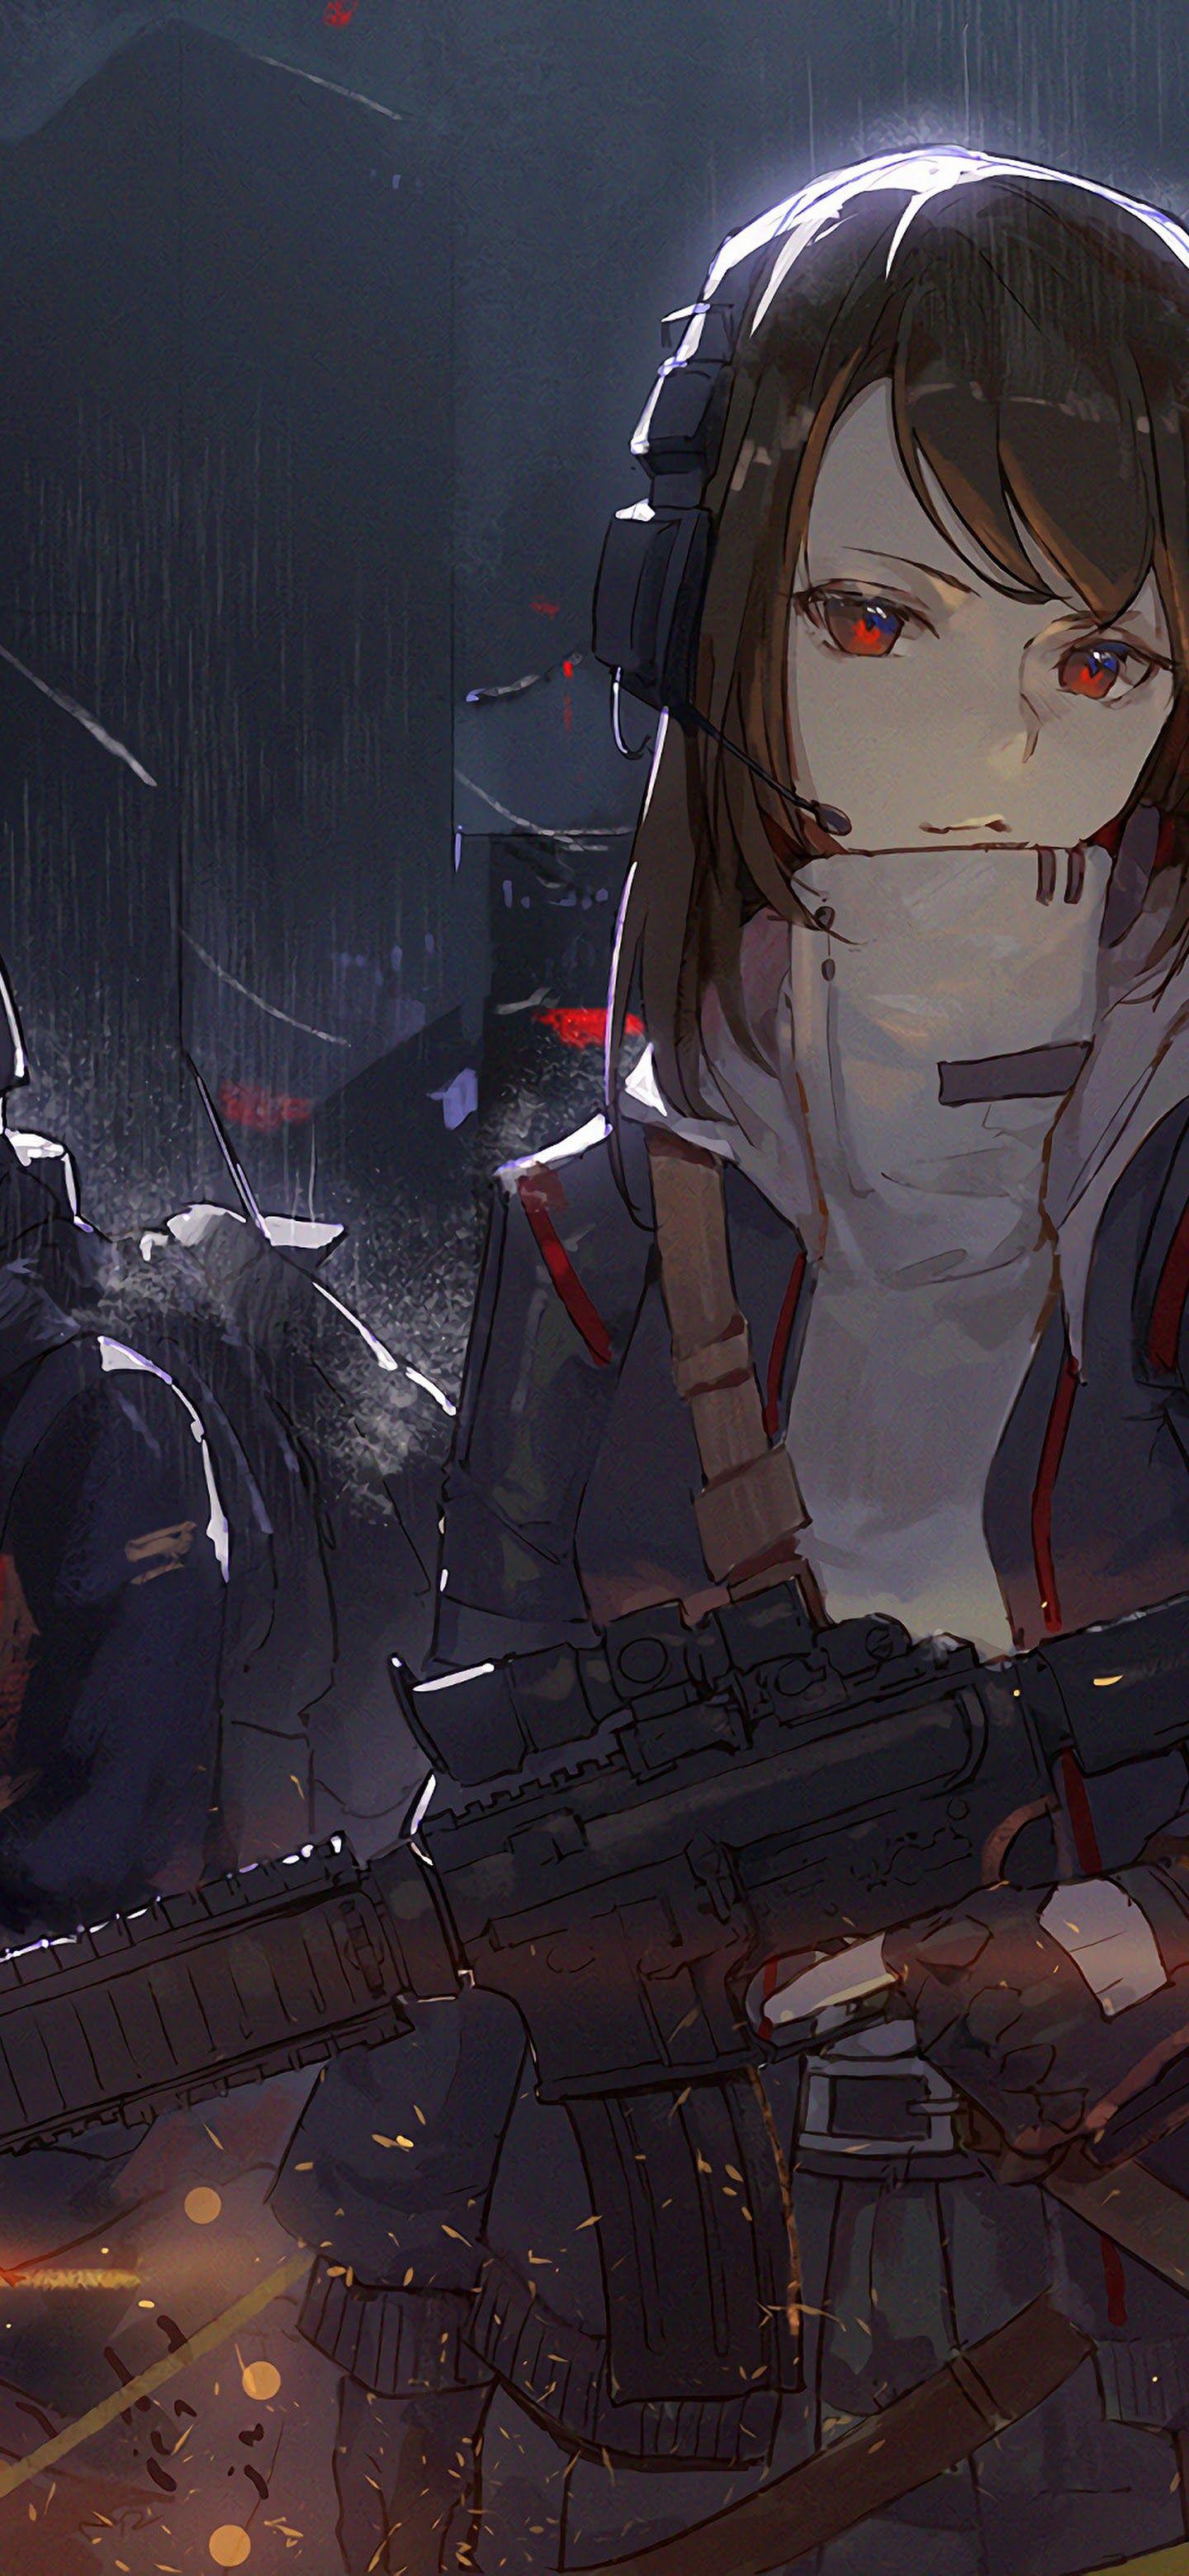 Anime Hd Wallpaper Portrait : Anime Portrait Wallpapers ...